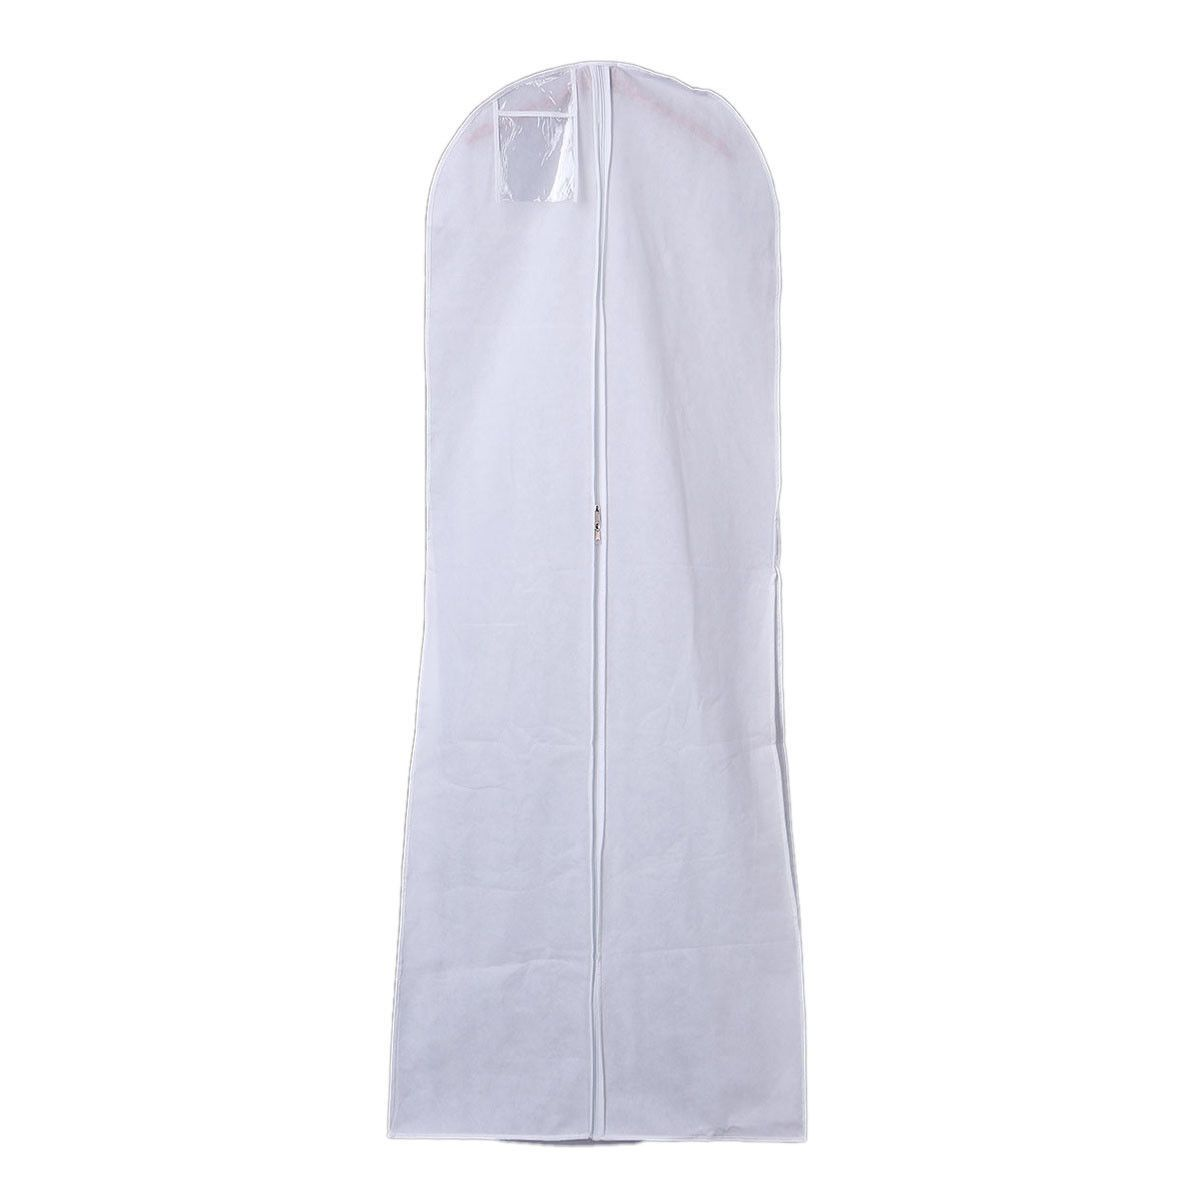 8 13 Aud Wedding Dress Bridal Gown Garment Cover Storage Bag Carry Zip Dustproof V5t4 Ebay Fashion Wedding Dress Garment Bags Hanging Wedding Dress Bridal Gowns